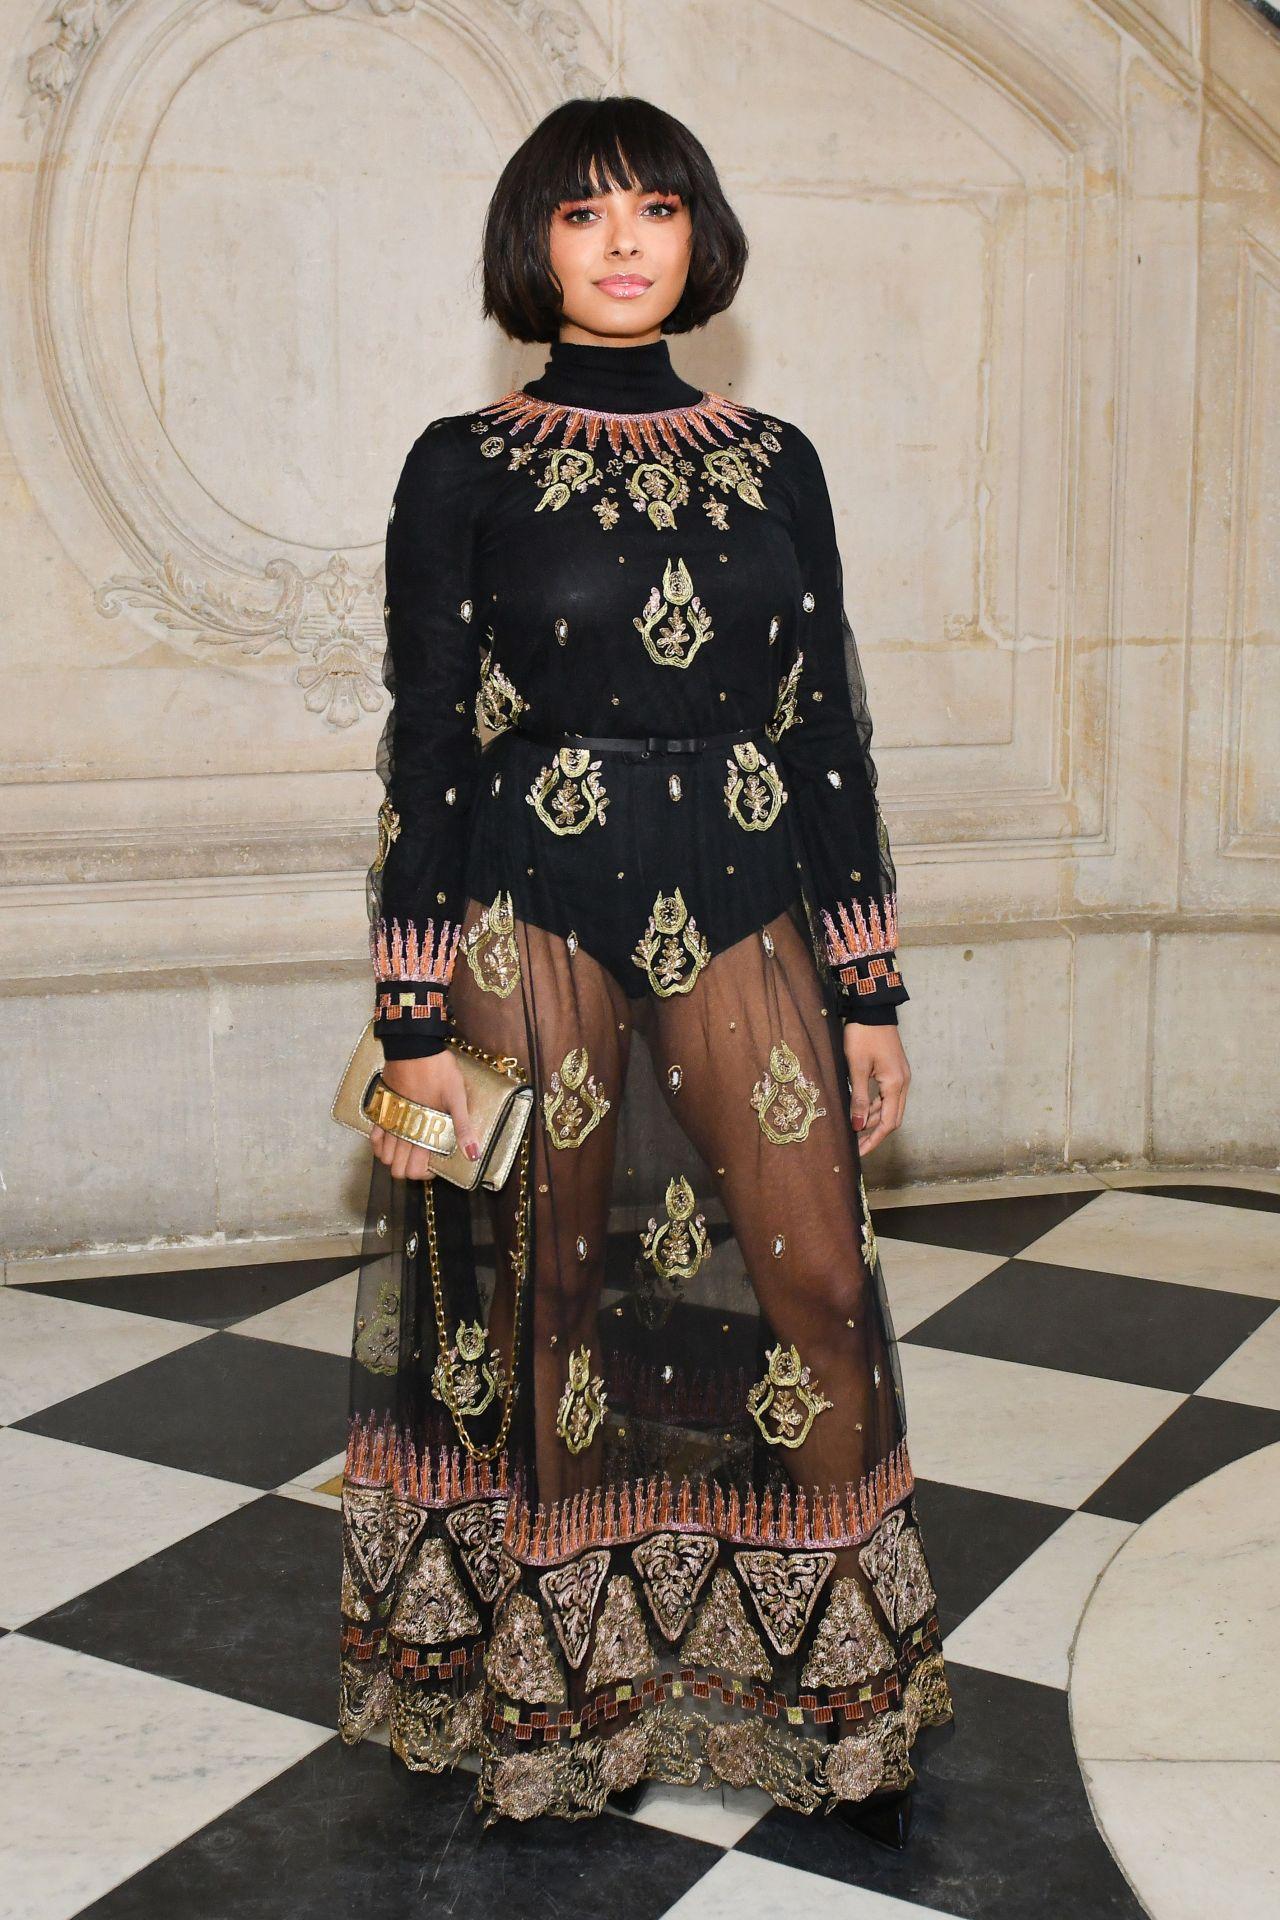 https://celebmafia.com/wp-content/uploads/2019/01/kat-graham-christian-dior-haute-couture-spring-summer-2019-show-in-paris-1.jpg